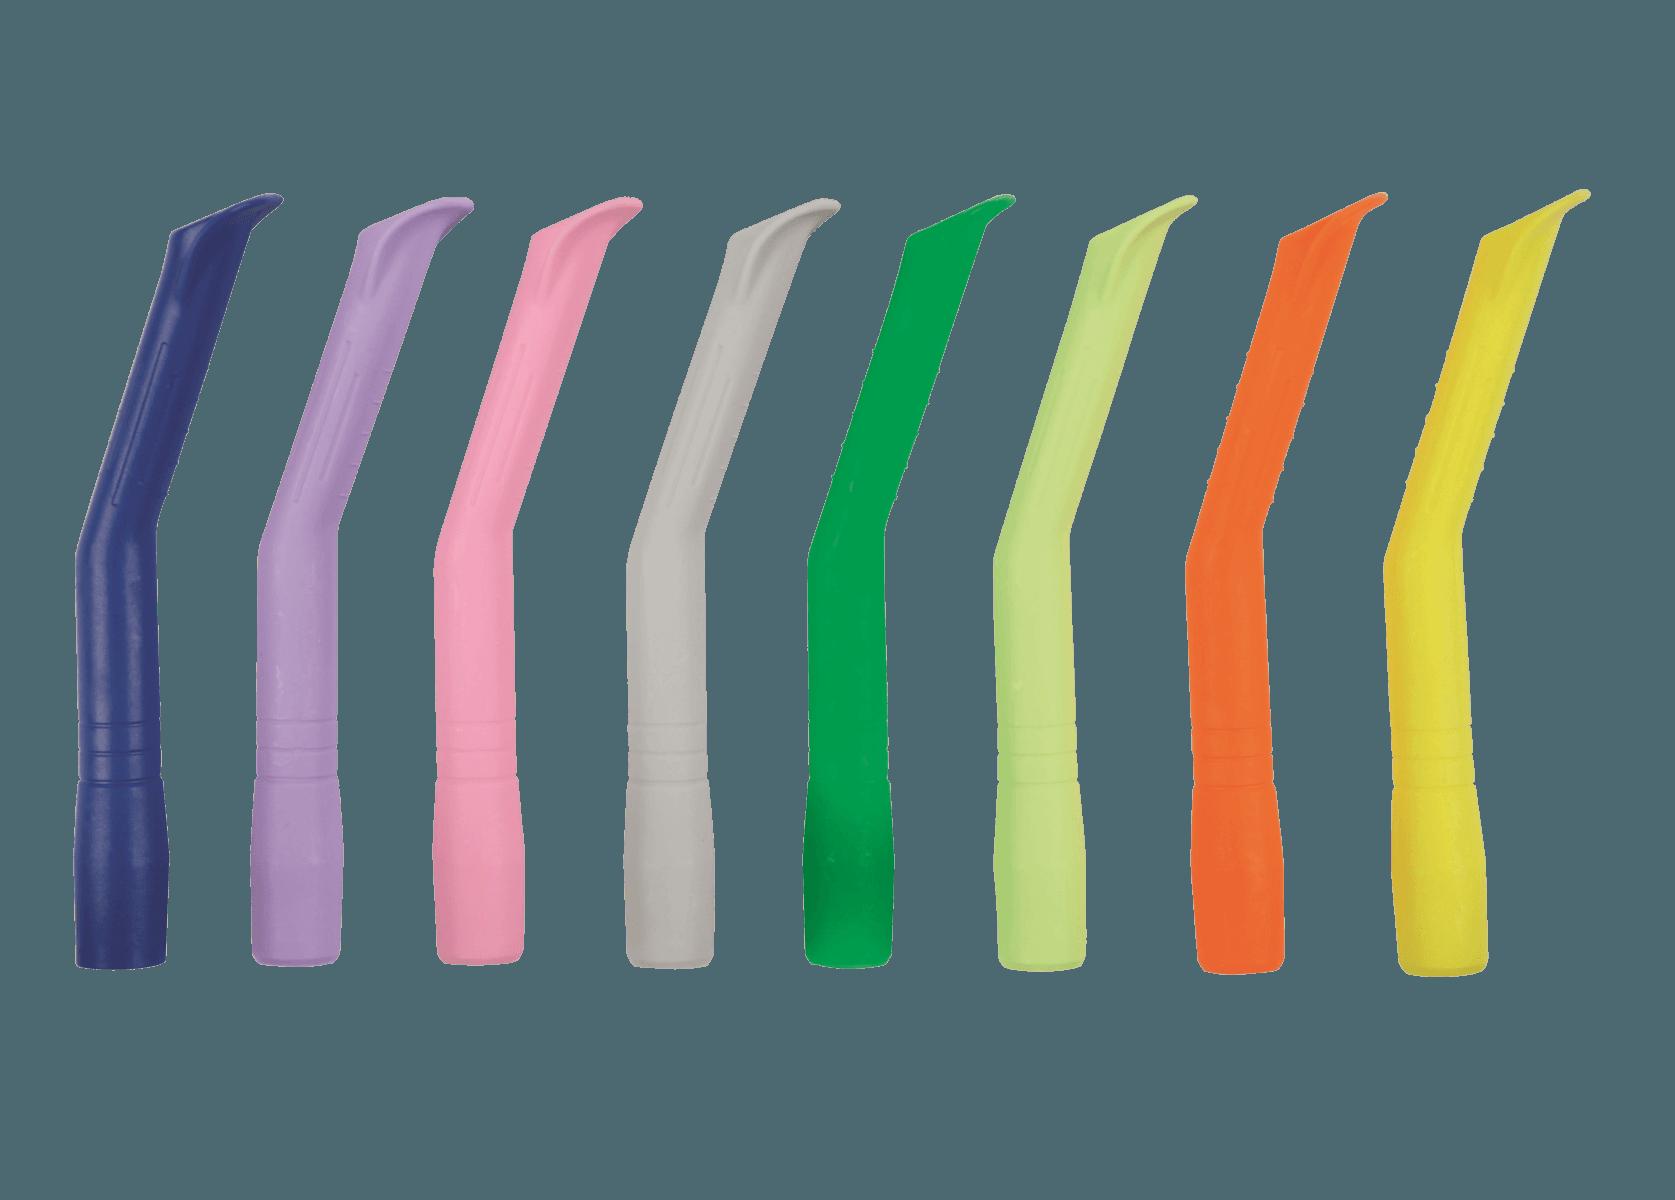 Monoart Universal-Absaugkanülen Classic, 9 Farben